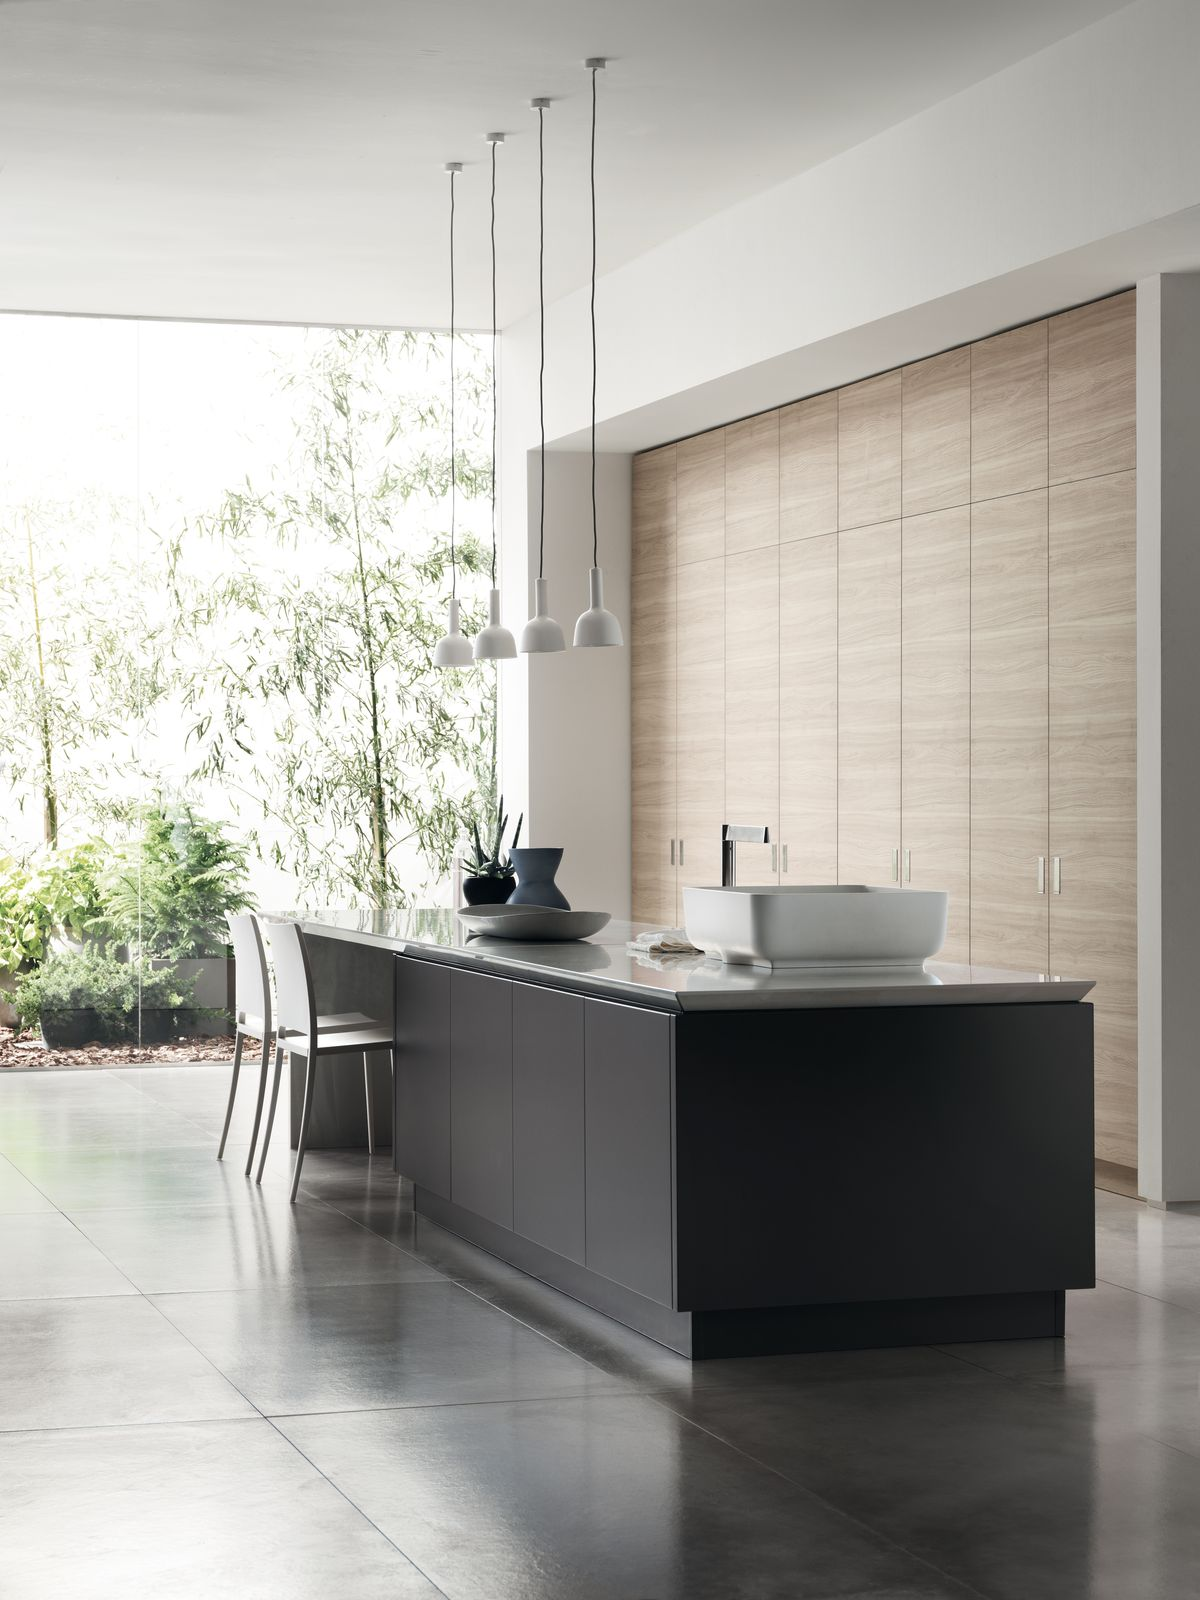 Scavolini kitchen environment Ki collection, design Nendo